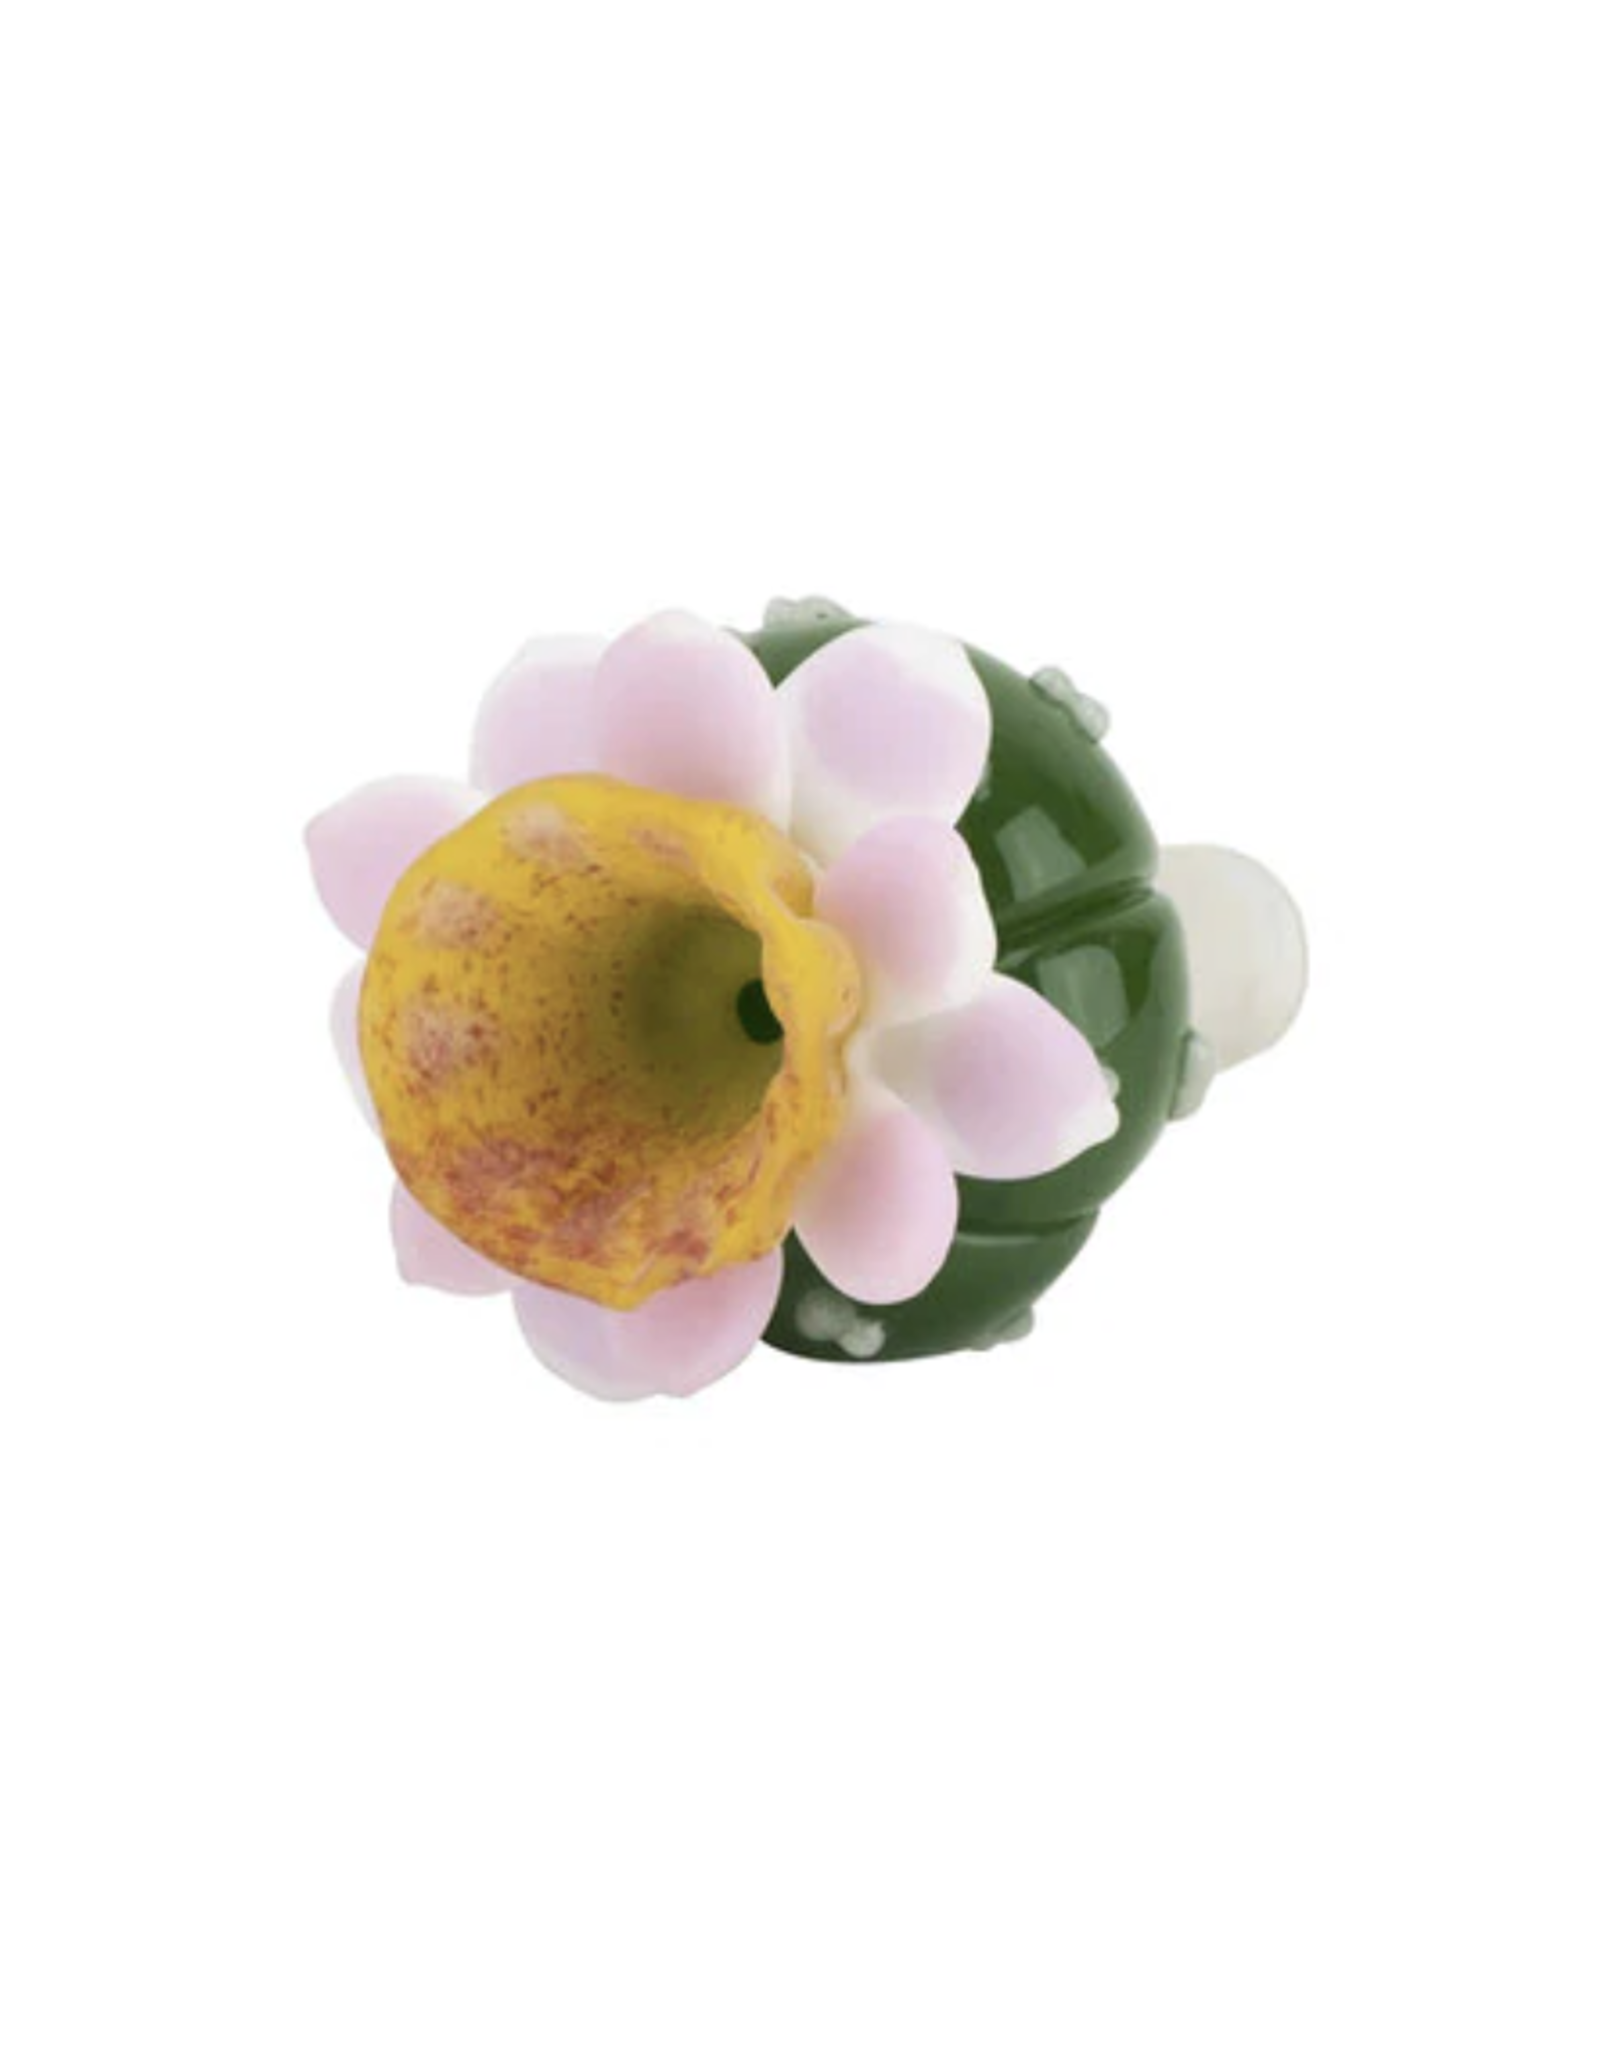 14mm Male Peyote Flower Bowl by Empire Glassworks